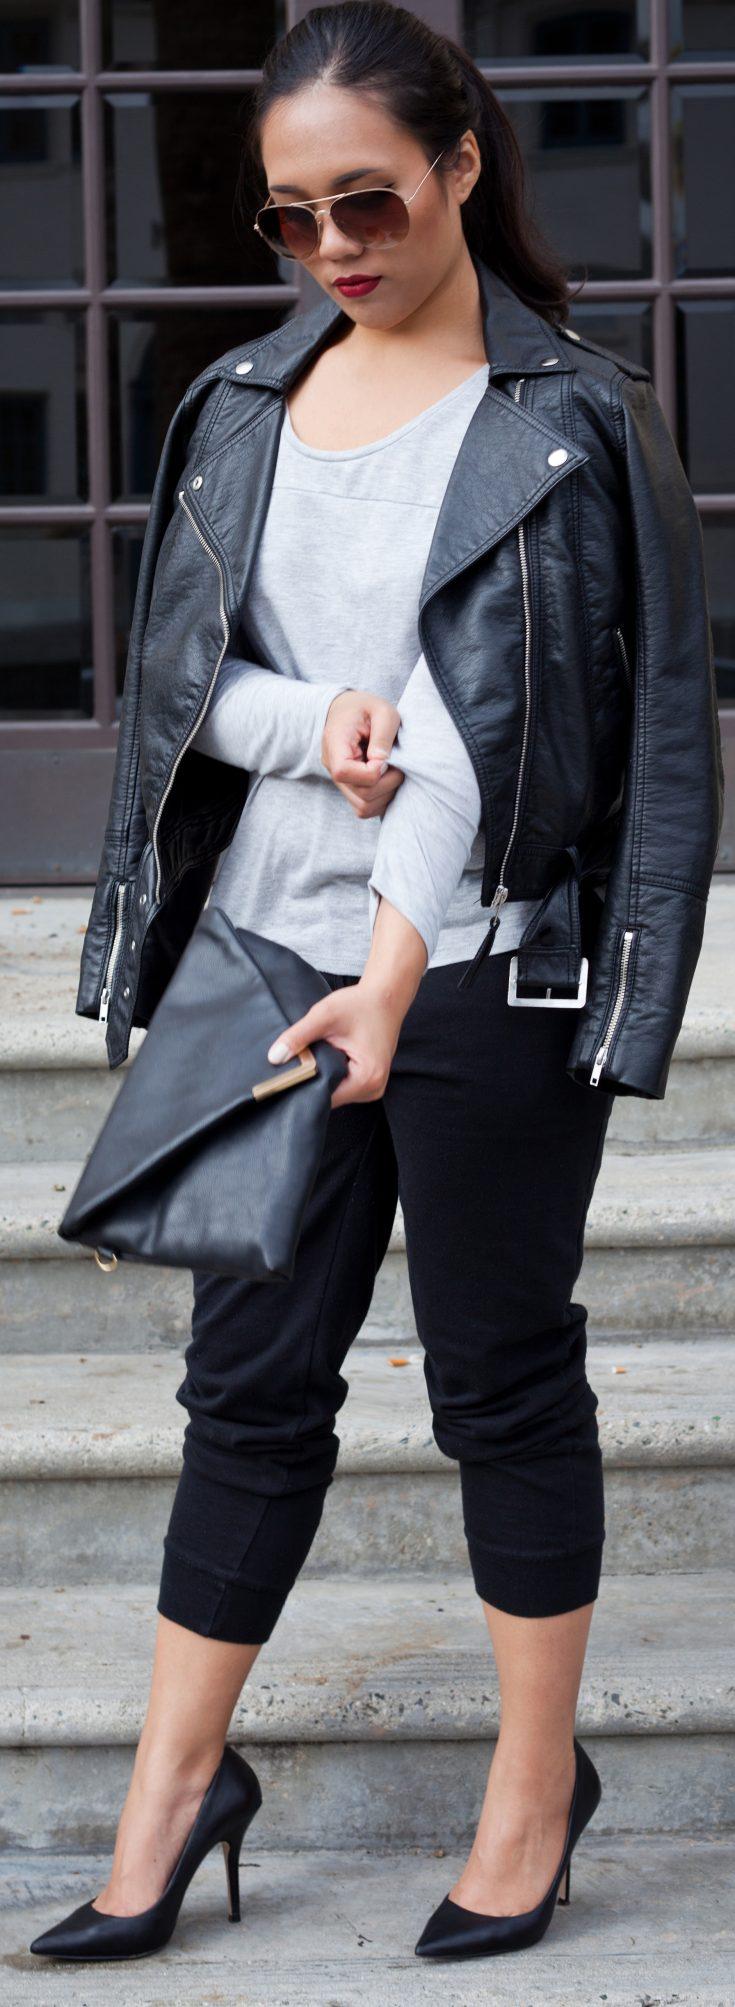 Shop the look - Aviator Sunglasses: $7.90, Biker jacket: $29.99, Longsleeve top: $6.90, Knit Sweatpants: $12.90, Pumps: $63.16, Clutch: $29.99 - THE BALLER ON A BUDGET